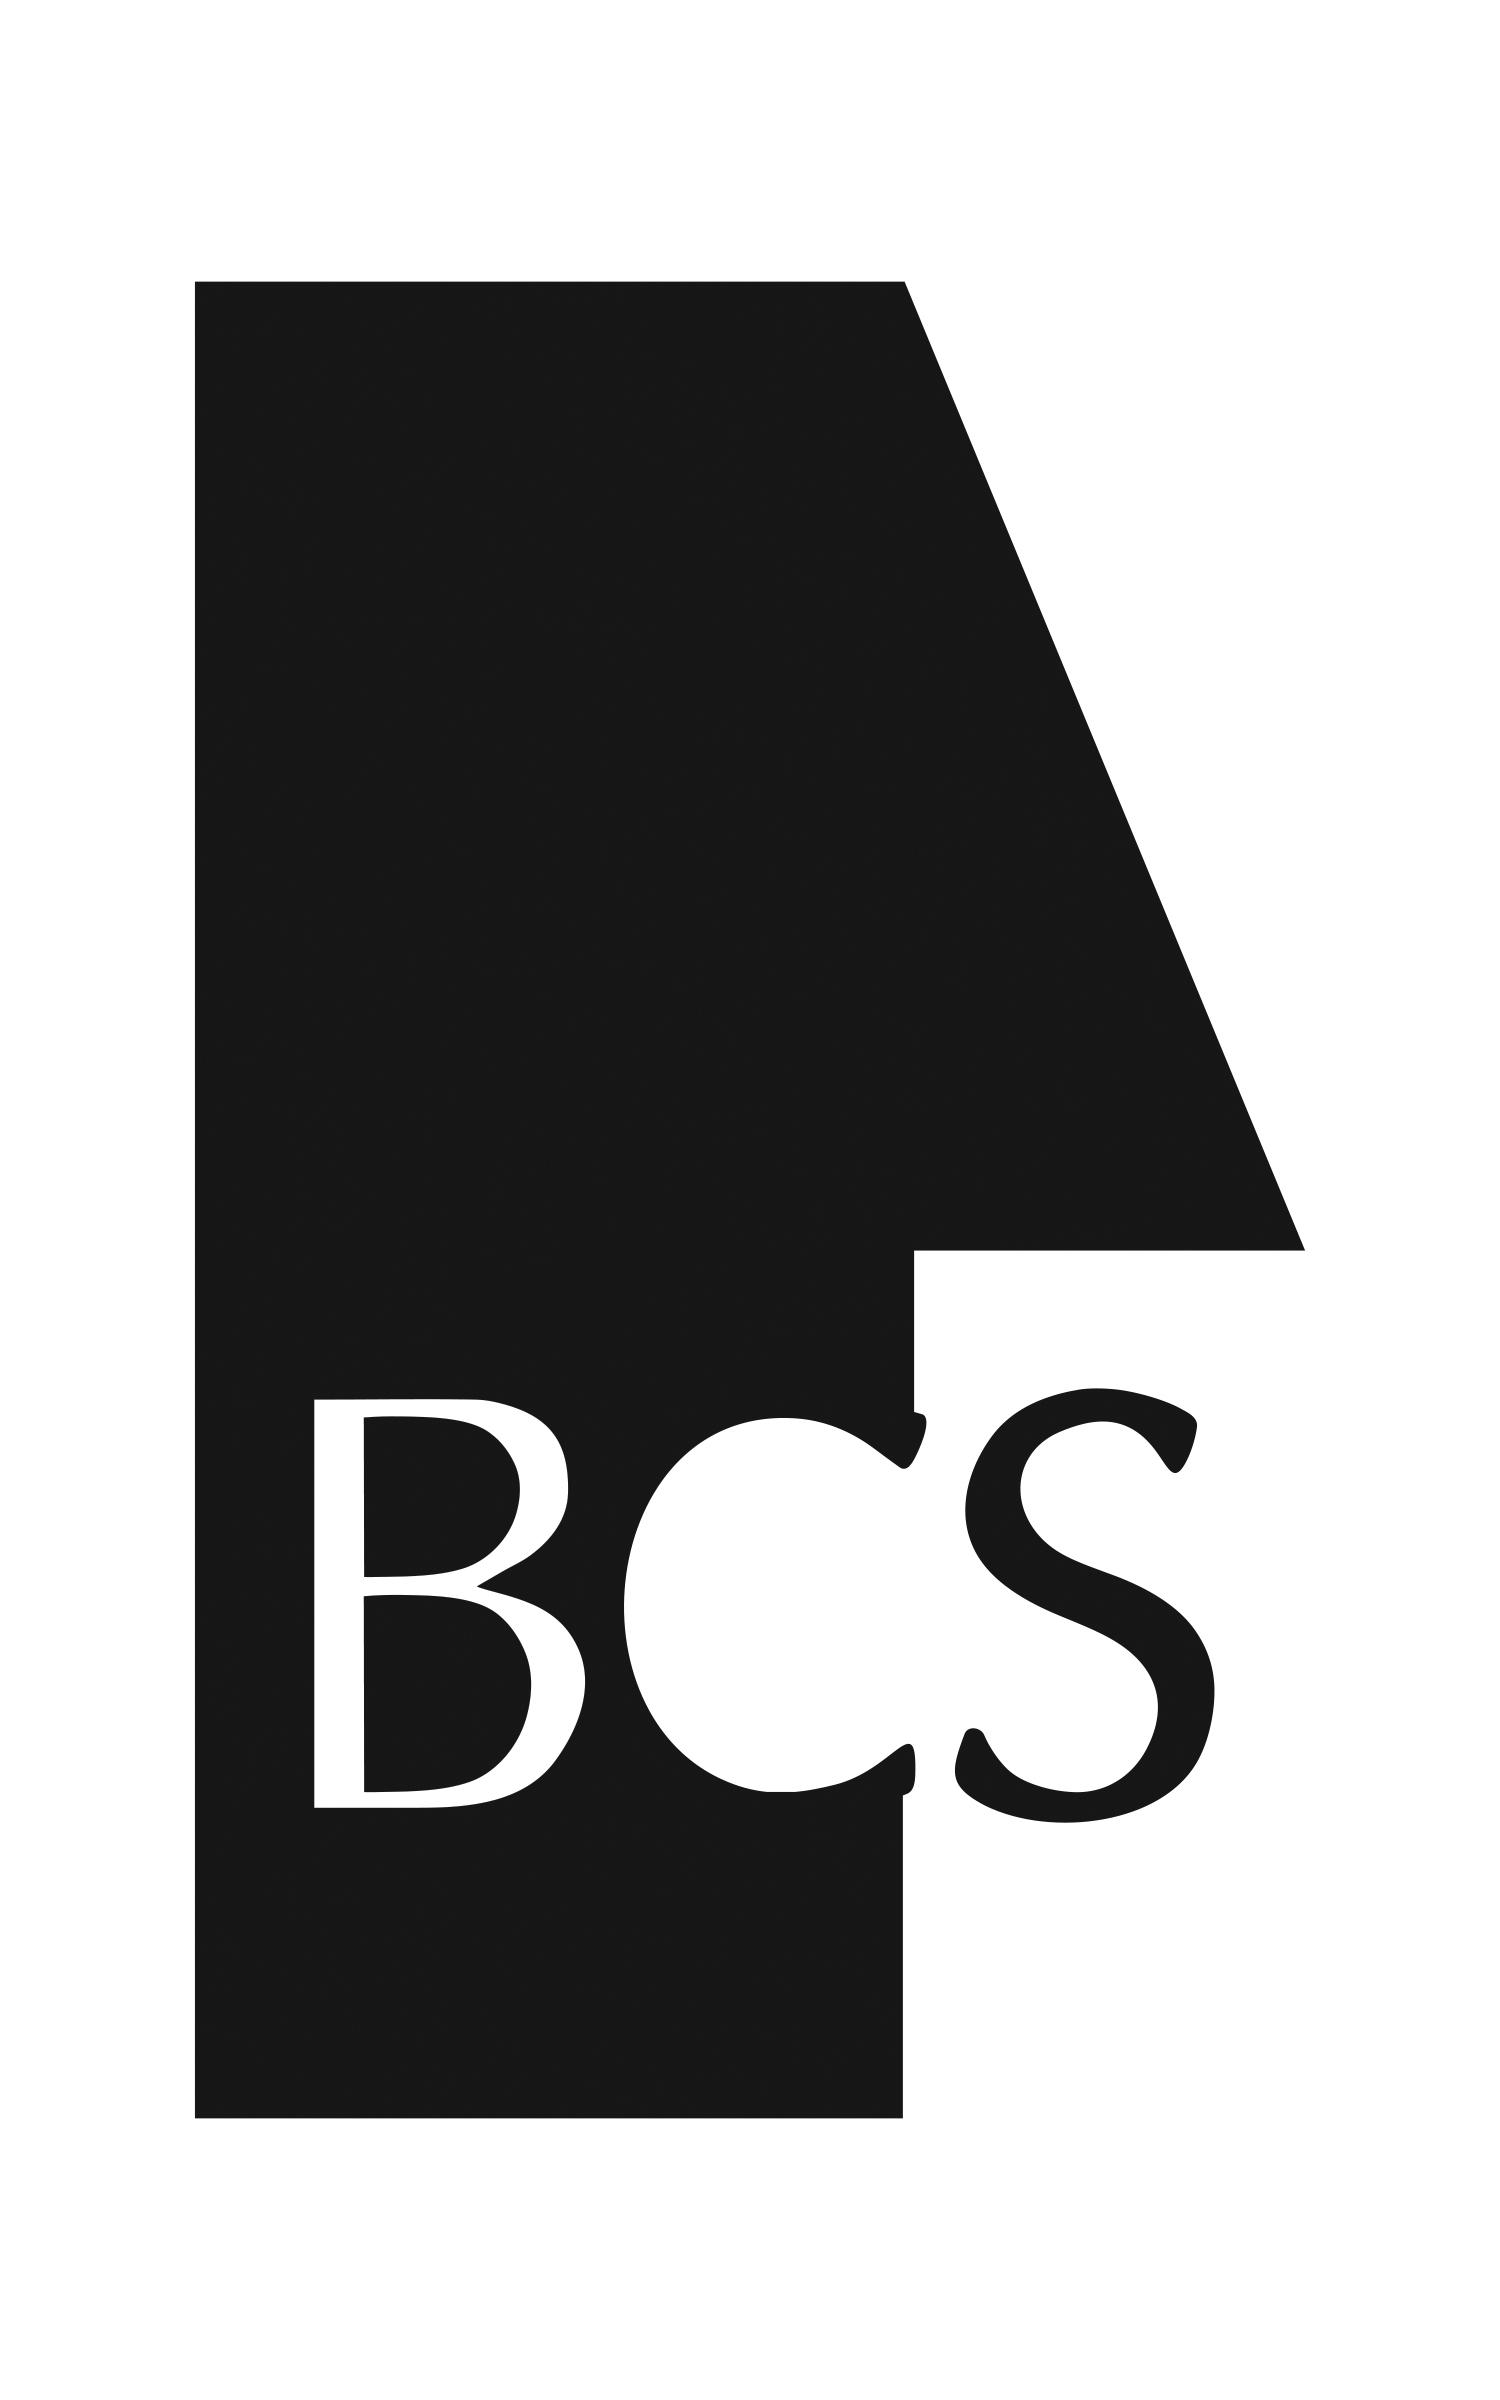 BCSlogo-transparent-hi-res.png